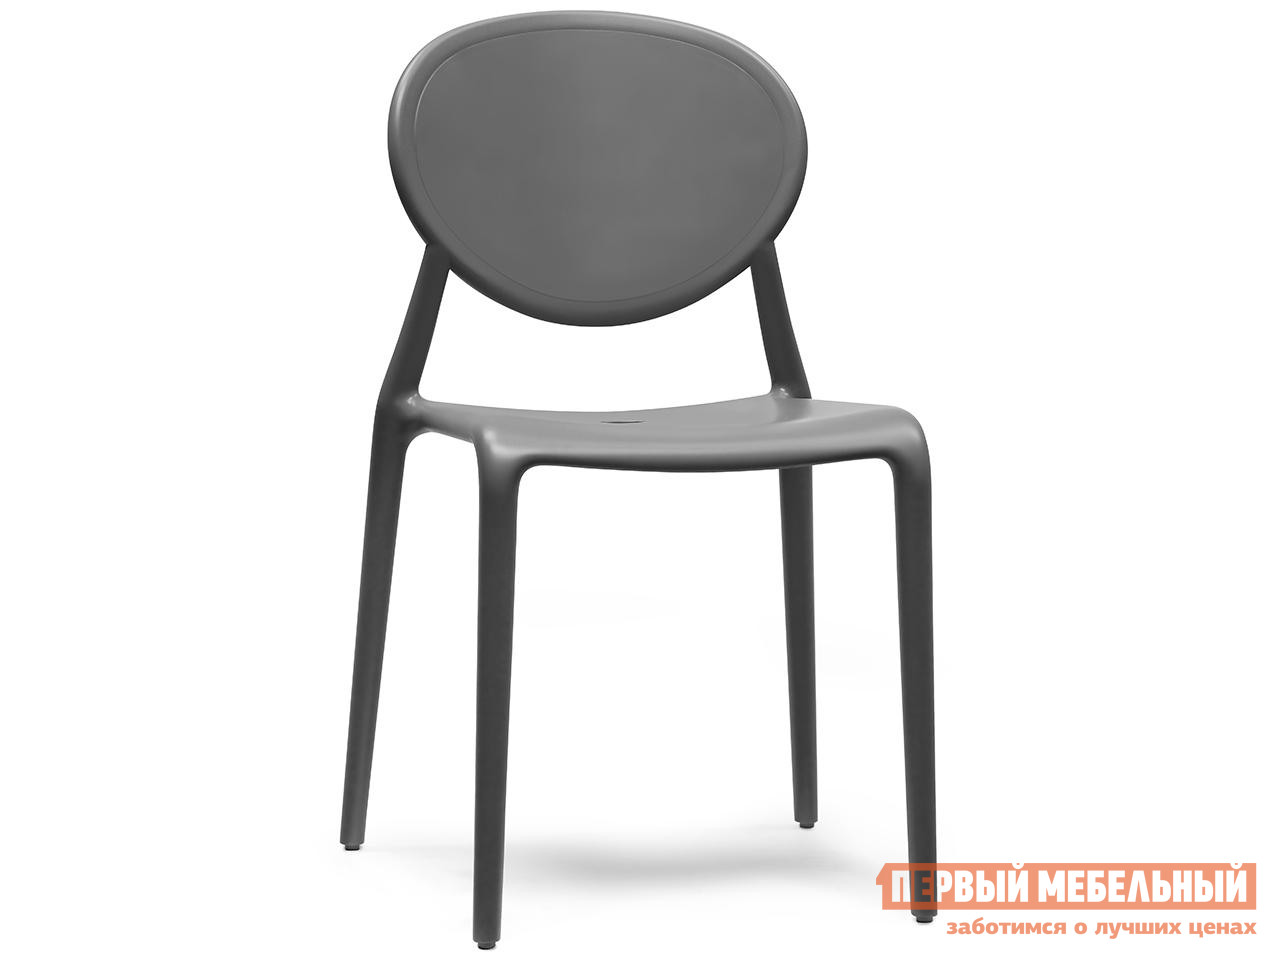 Пластиковый стул Рихаус Gio 005/231581 пластиковый стул рихаус riva bistrot